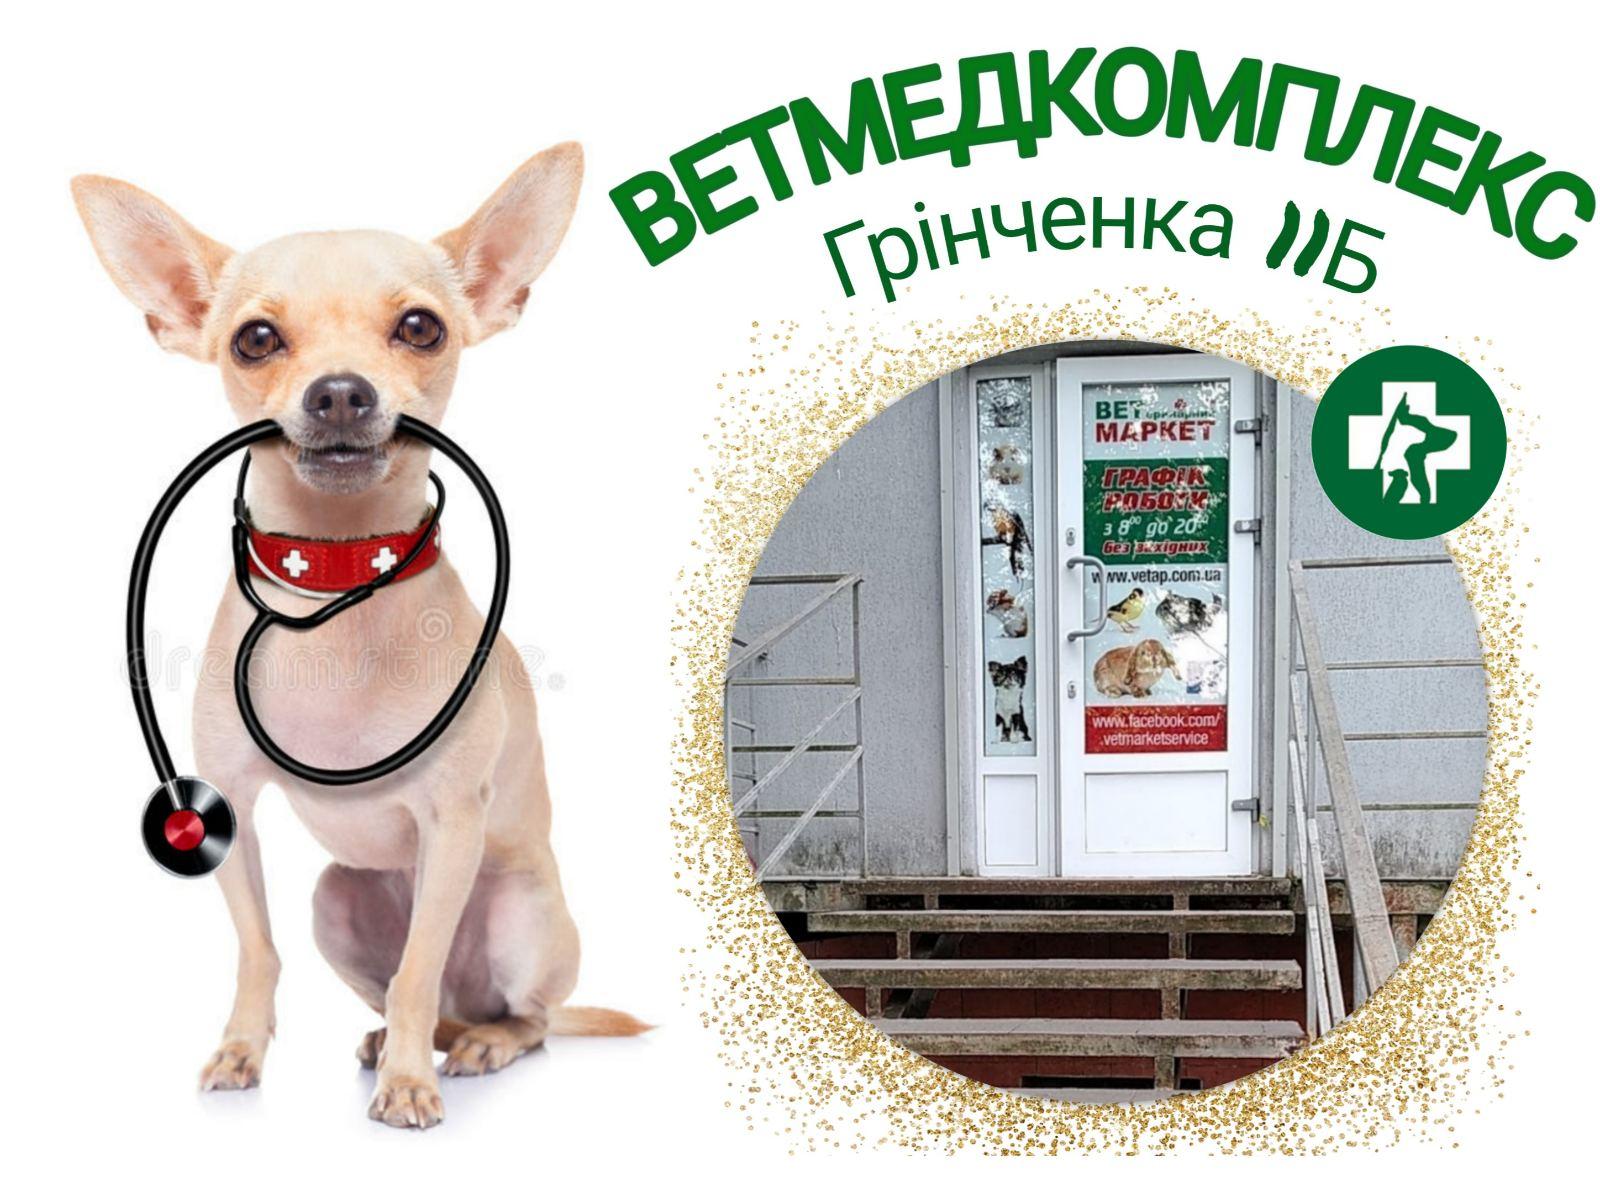 ветеринарни кабінет Грінченка